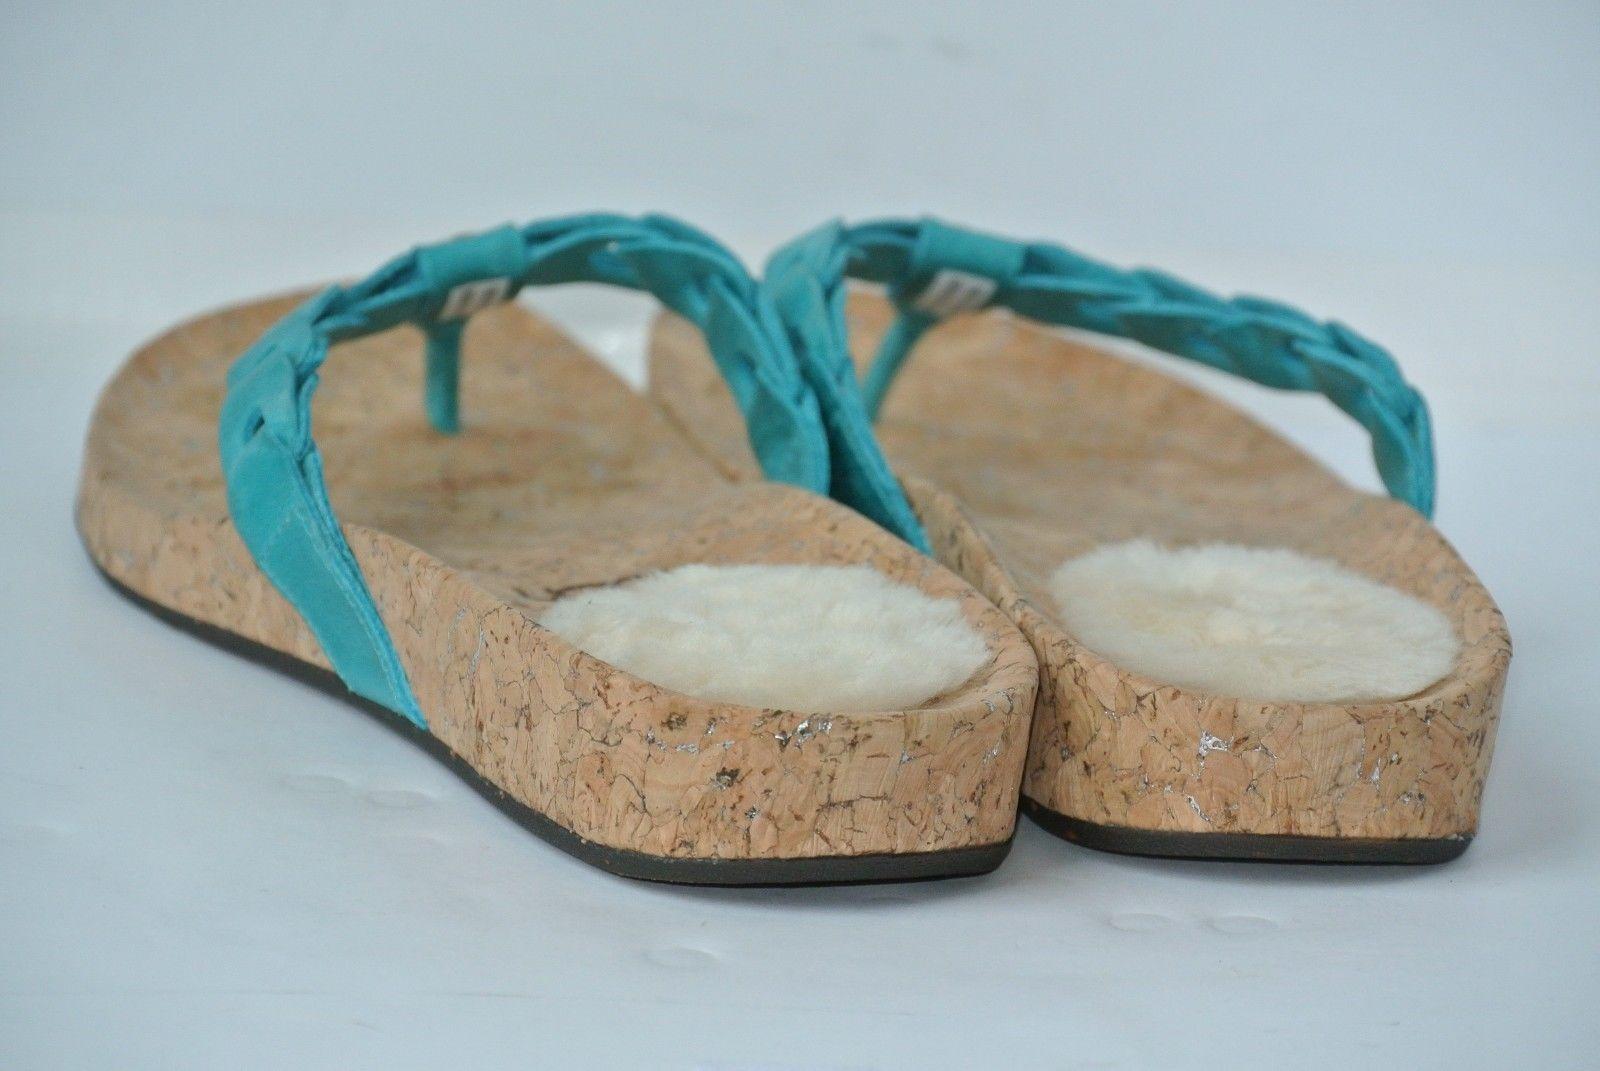 8b1f9310865b UGG AUSTRALIA Womens Sz 8 Aqua Blue Leather Flip Flop Sandals 1804 WORN ONCE